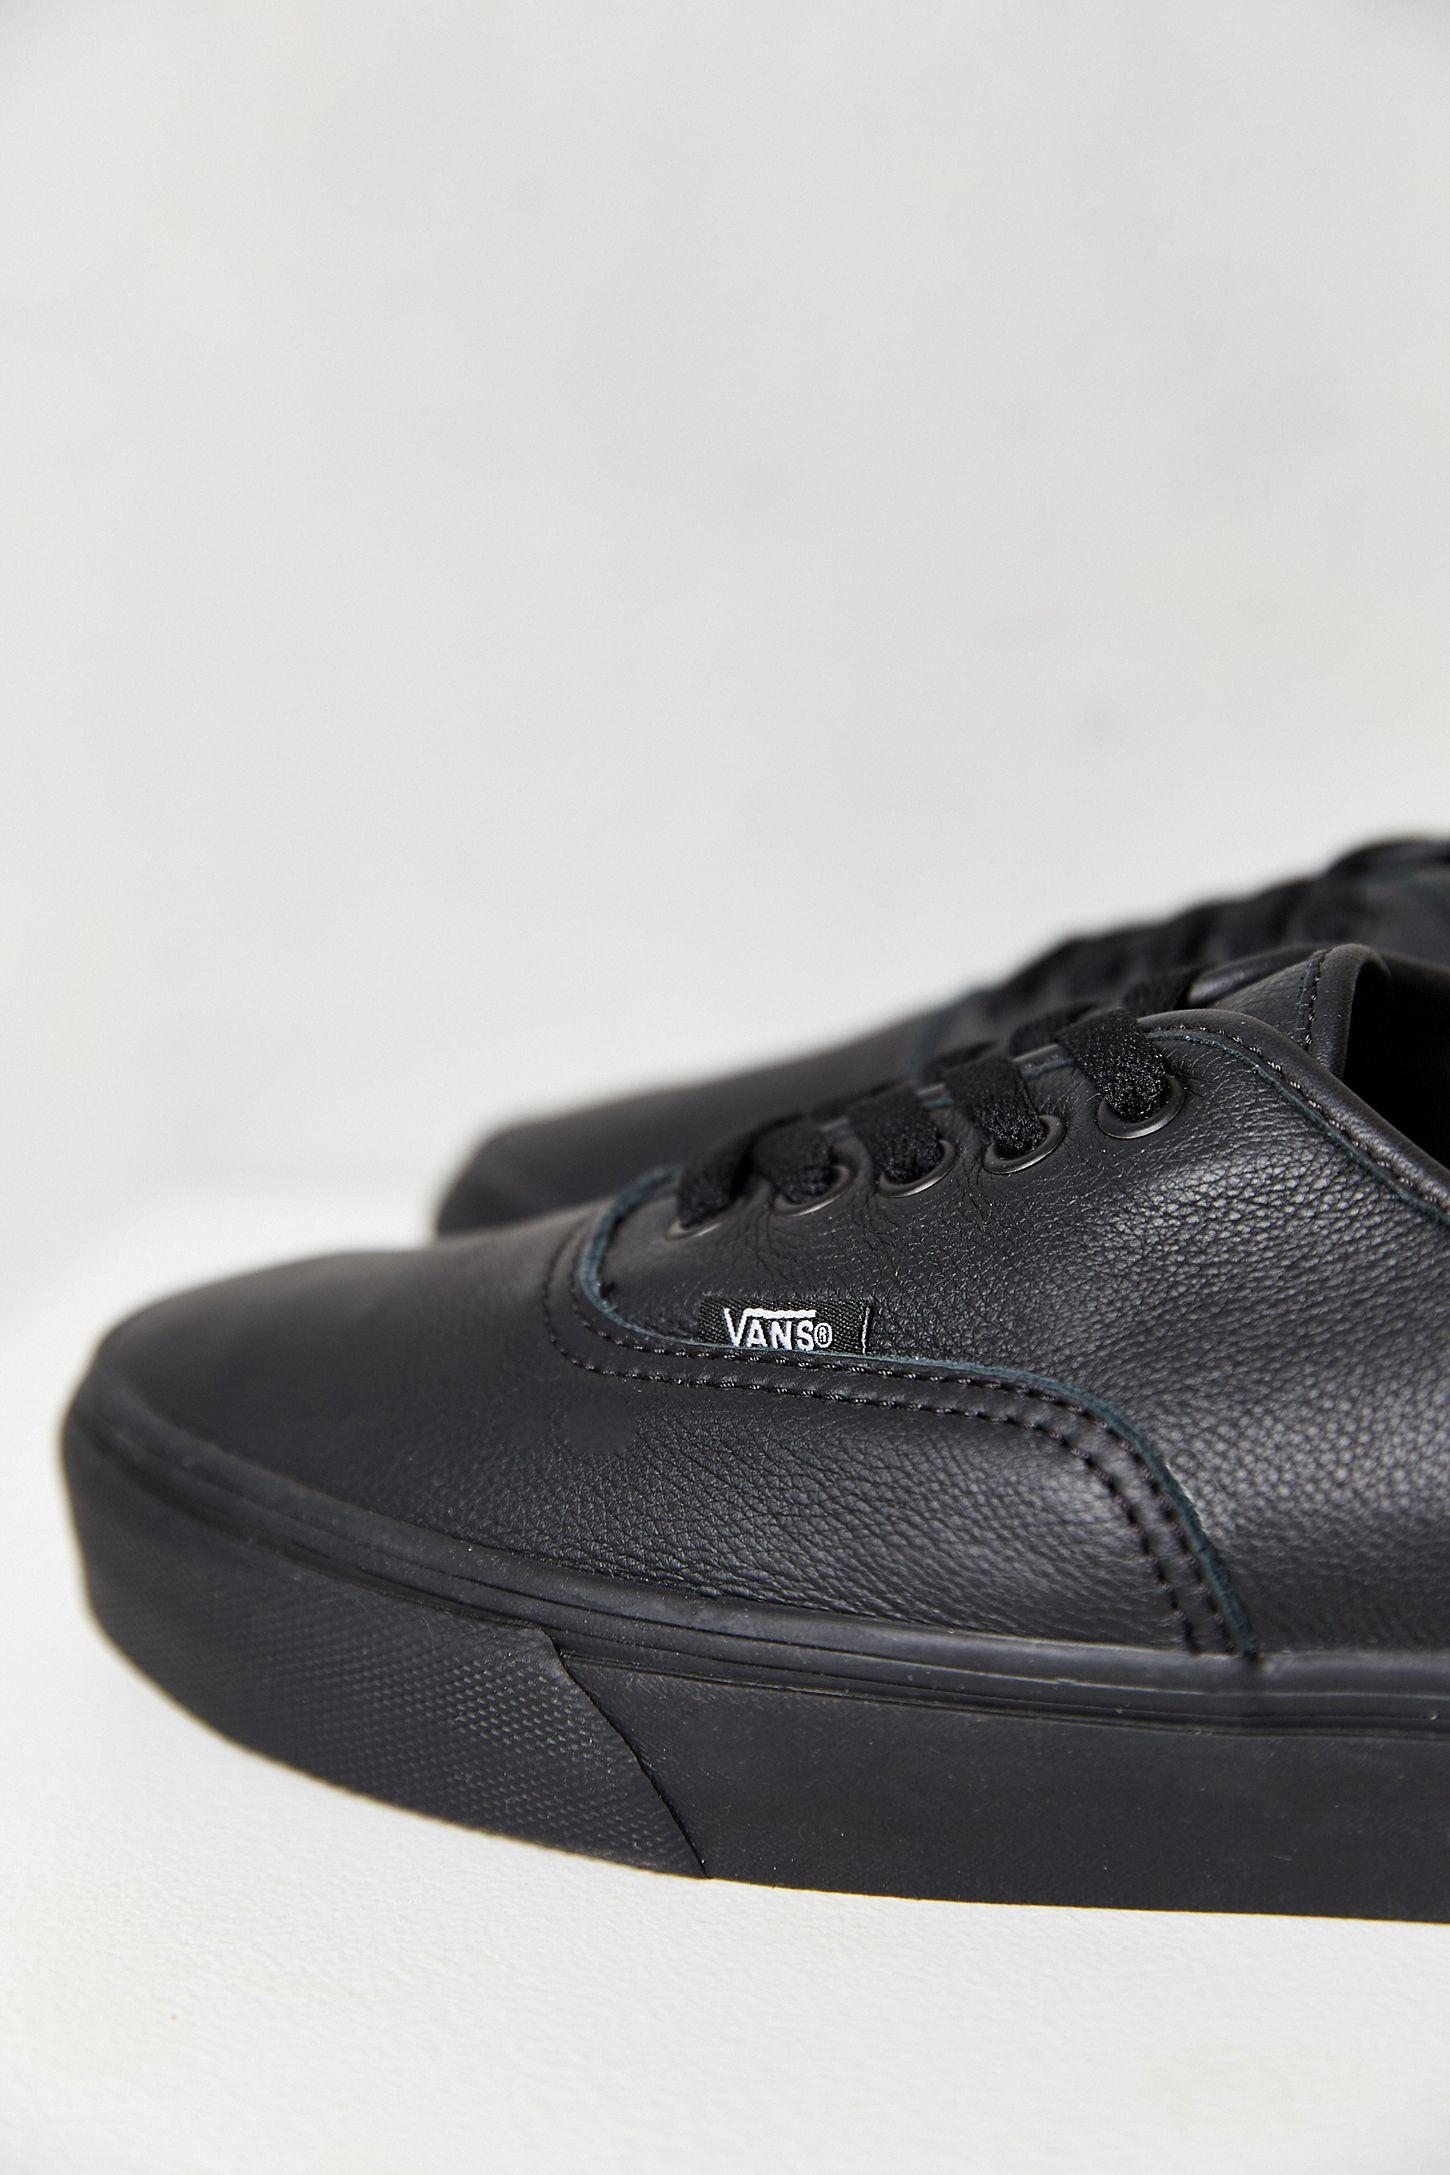 7313fa8a08 Slide View  4  Vans Authentic Italian Leather Monochromatic Sneaker